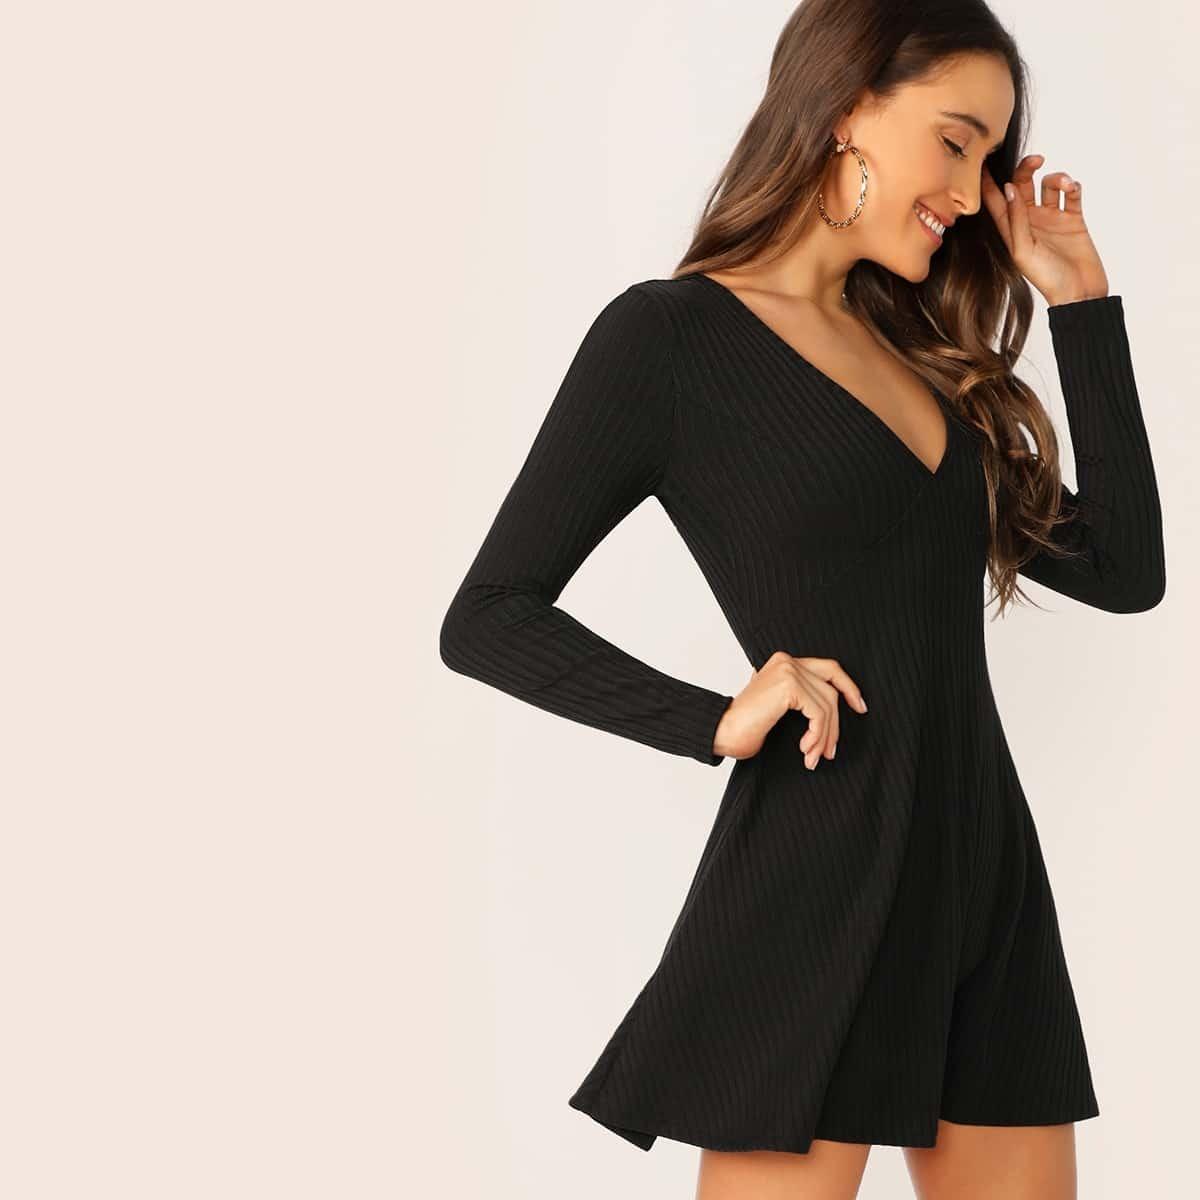 SHEIN coupon: V-Neck Rib-knit Dress